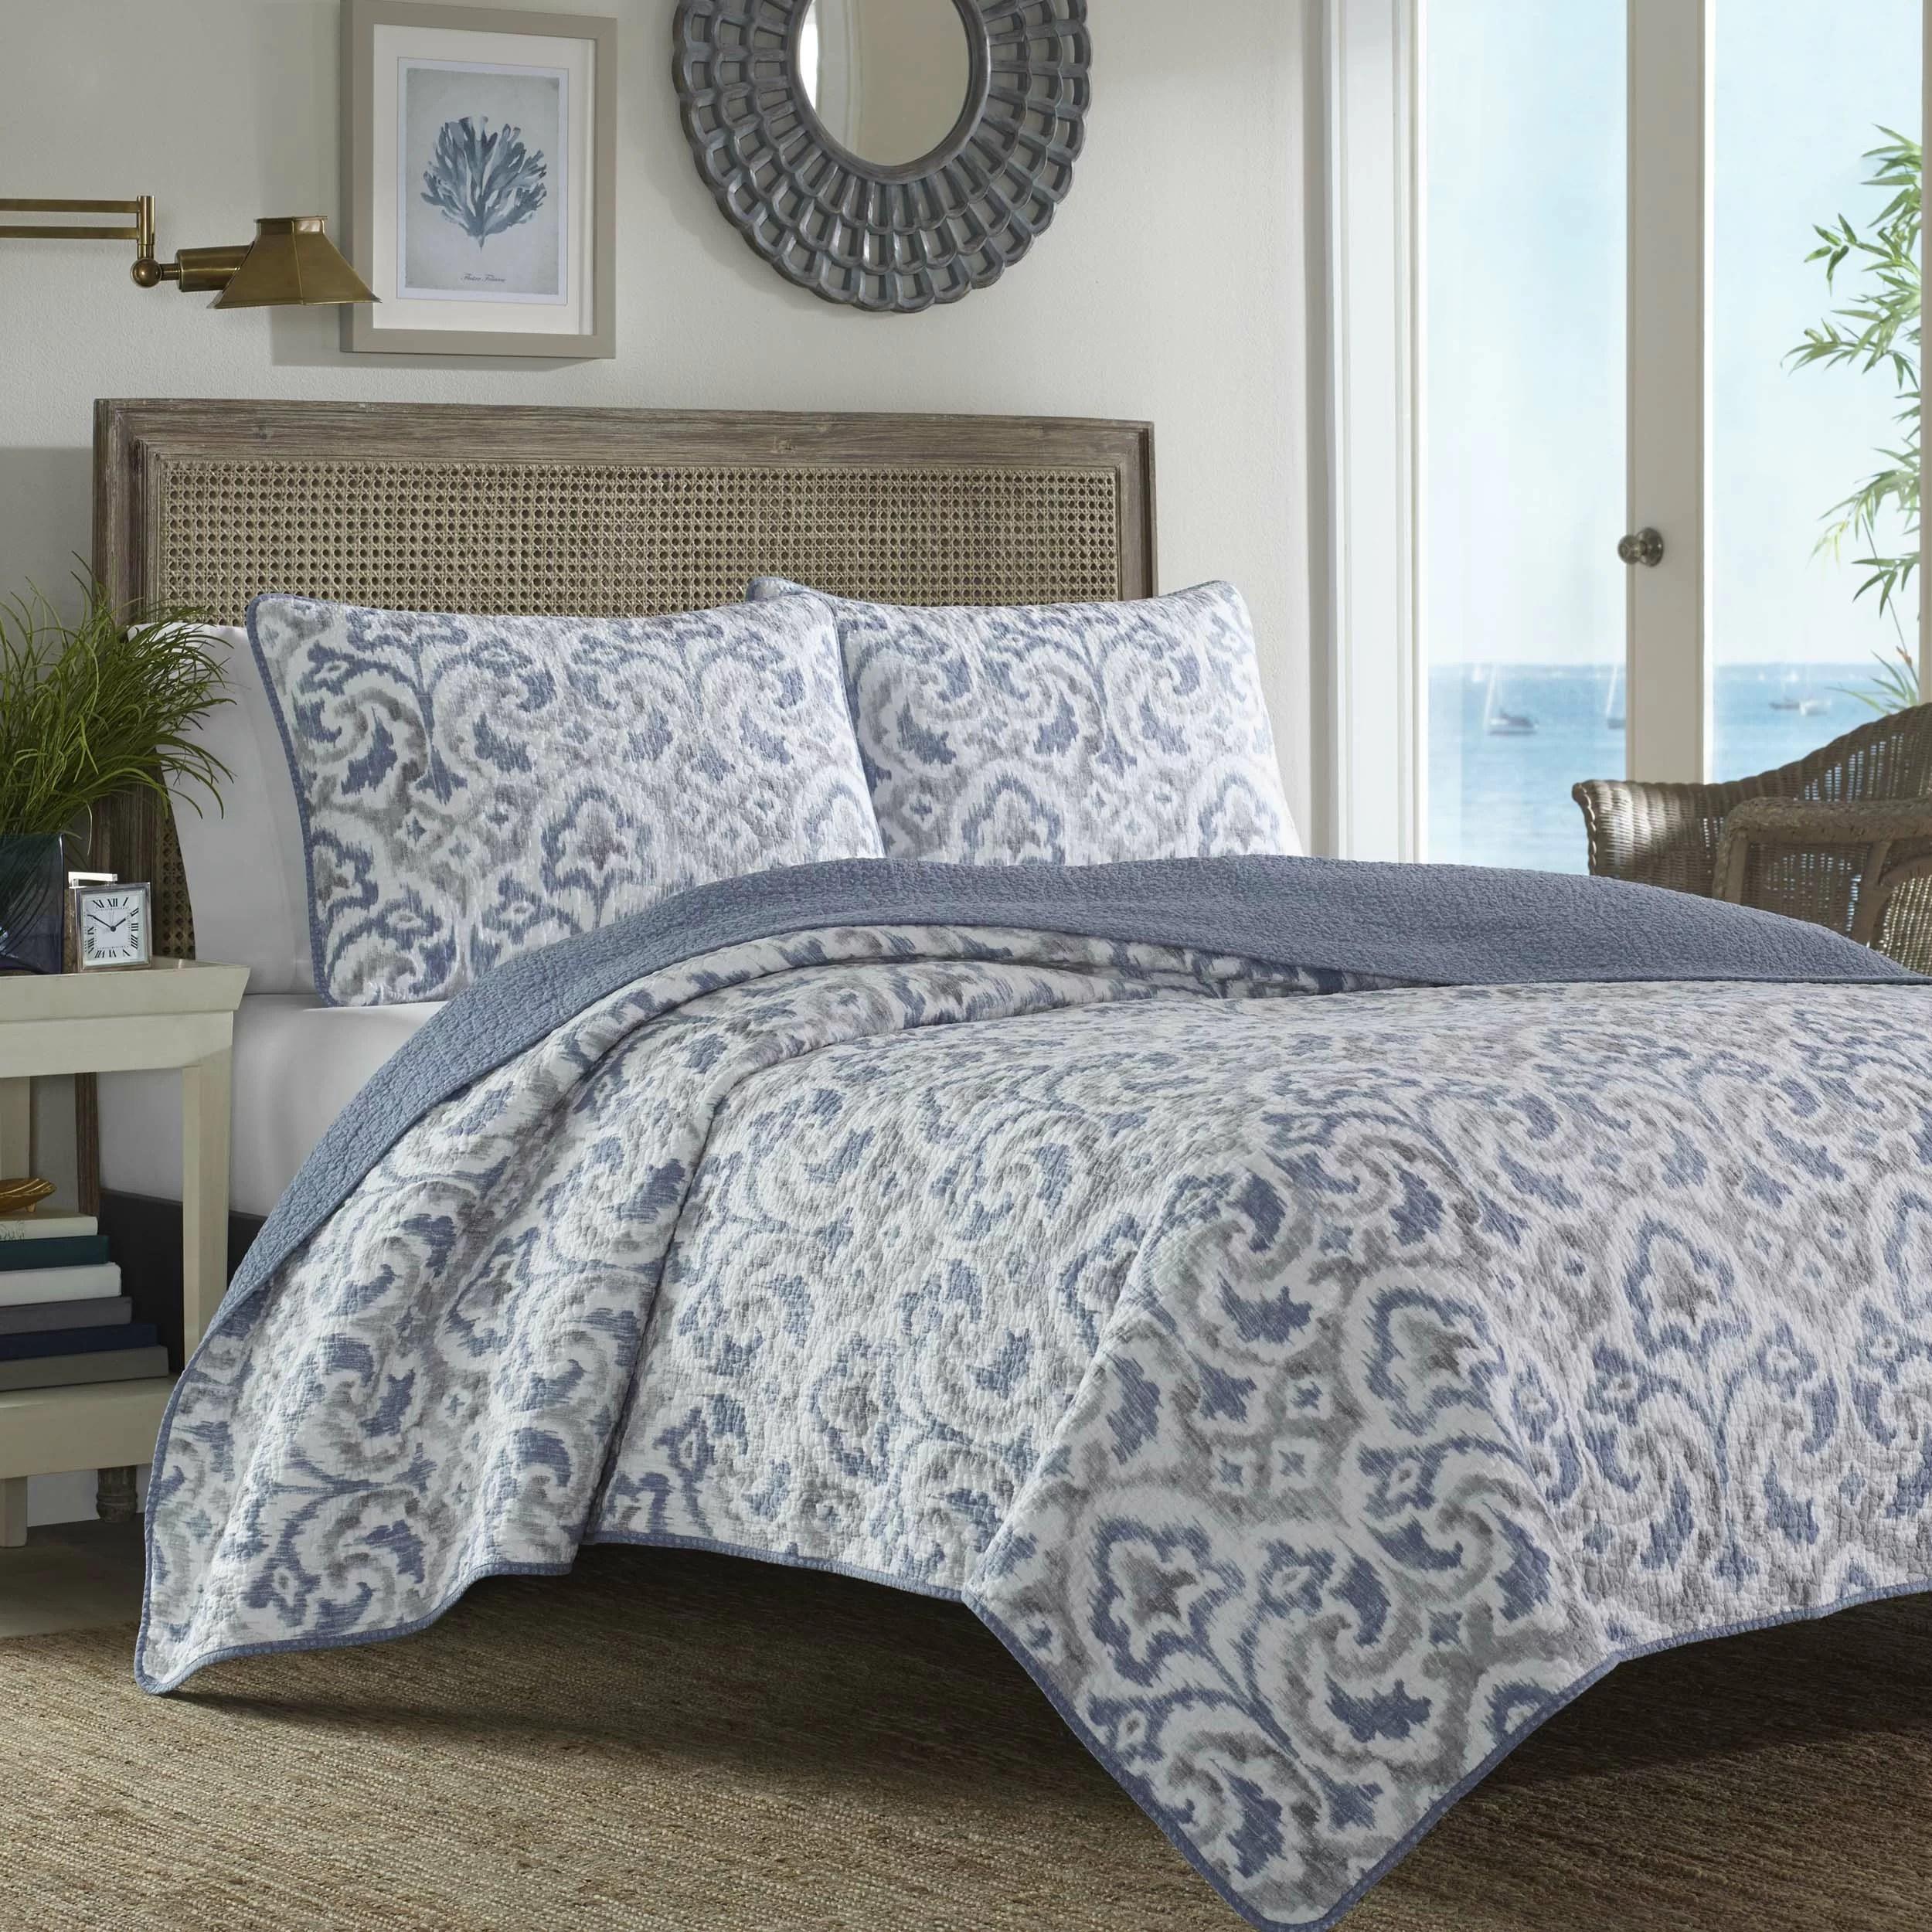 Tommy Bahama Bedding Cape Verde Reversible Quilt Set